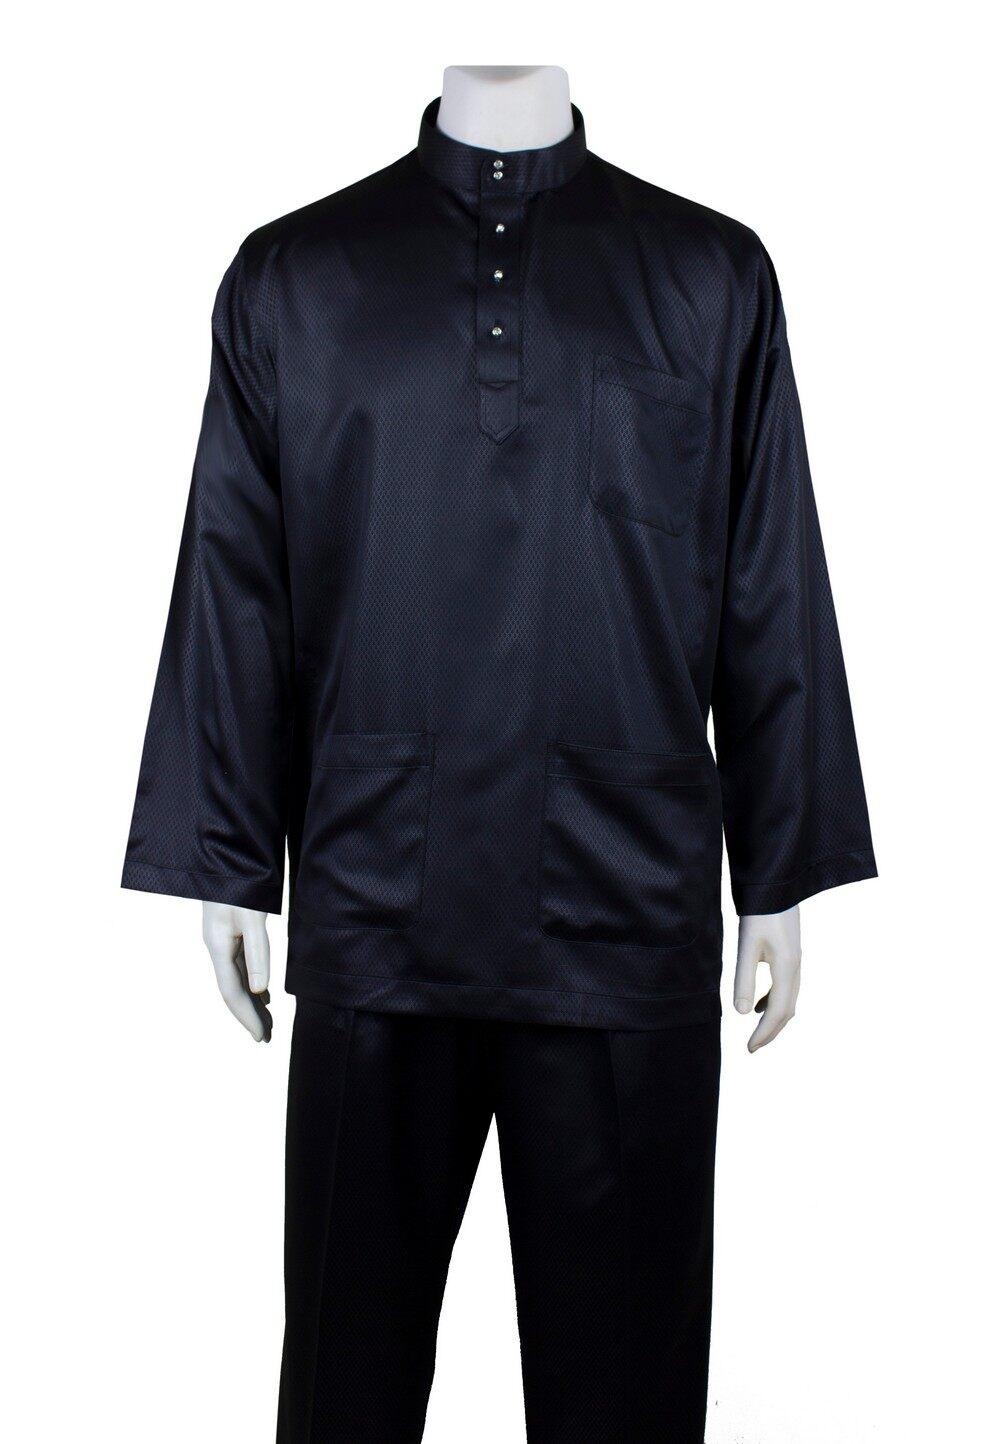 Baju Melayu Tradisional Black (80635NSL)